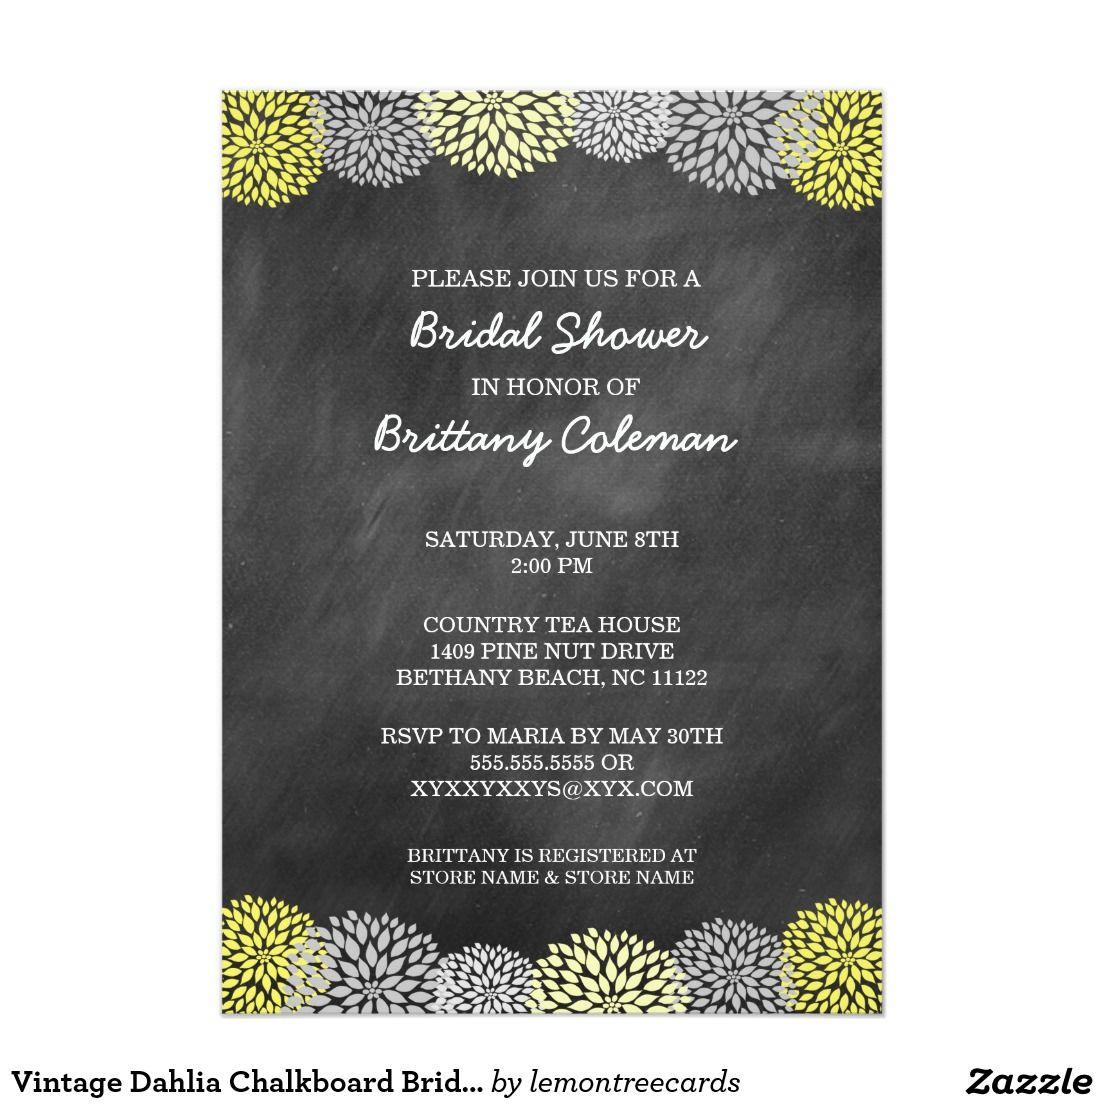 Vintage dahlia chalkboard bridal shower invites classy nice and vintage dahlia chalkboard bridal shower invites filmwisefo